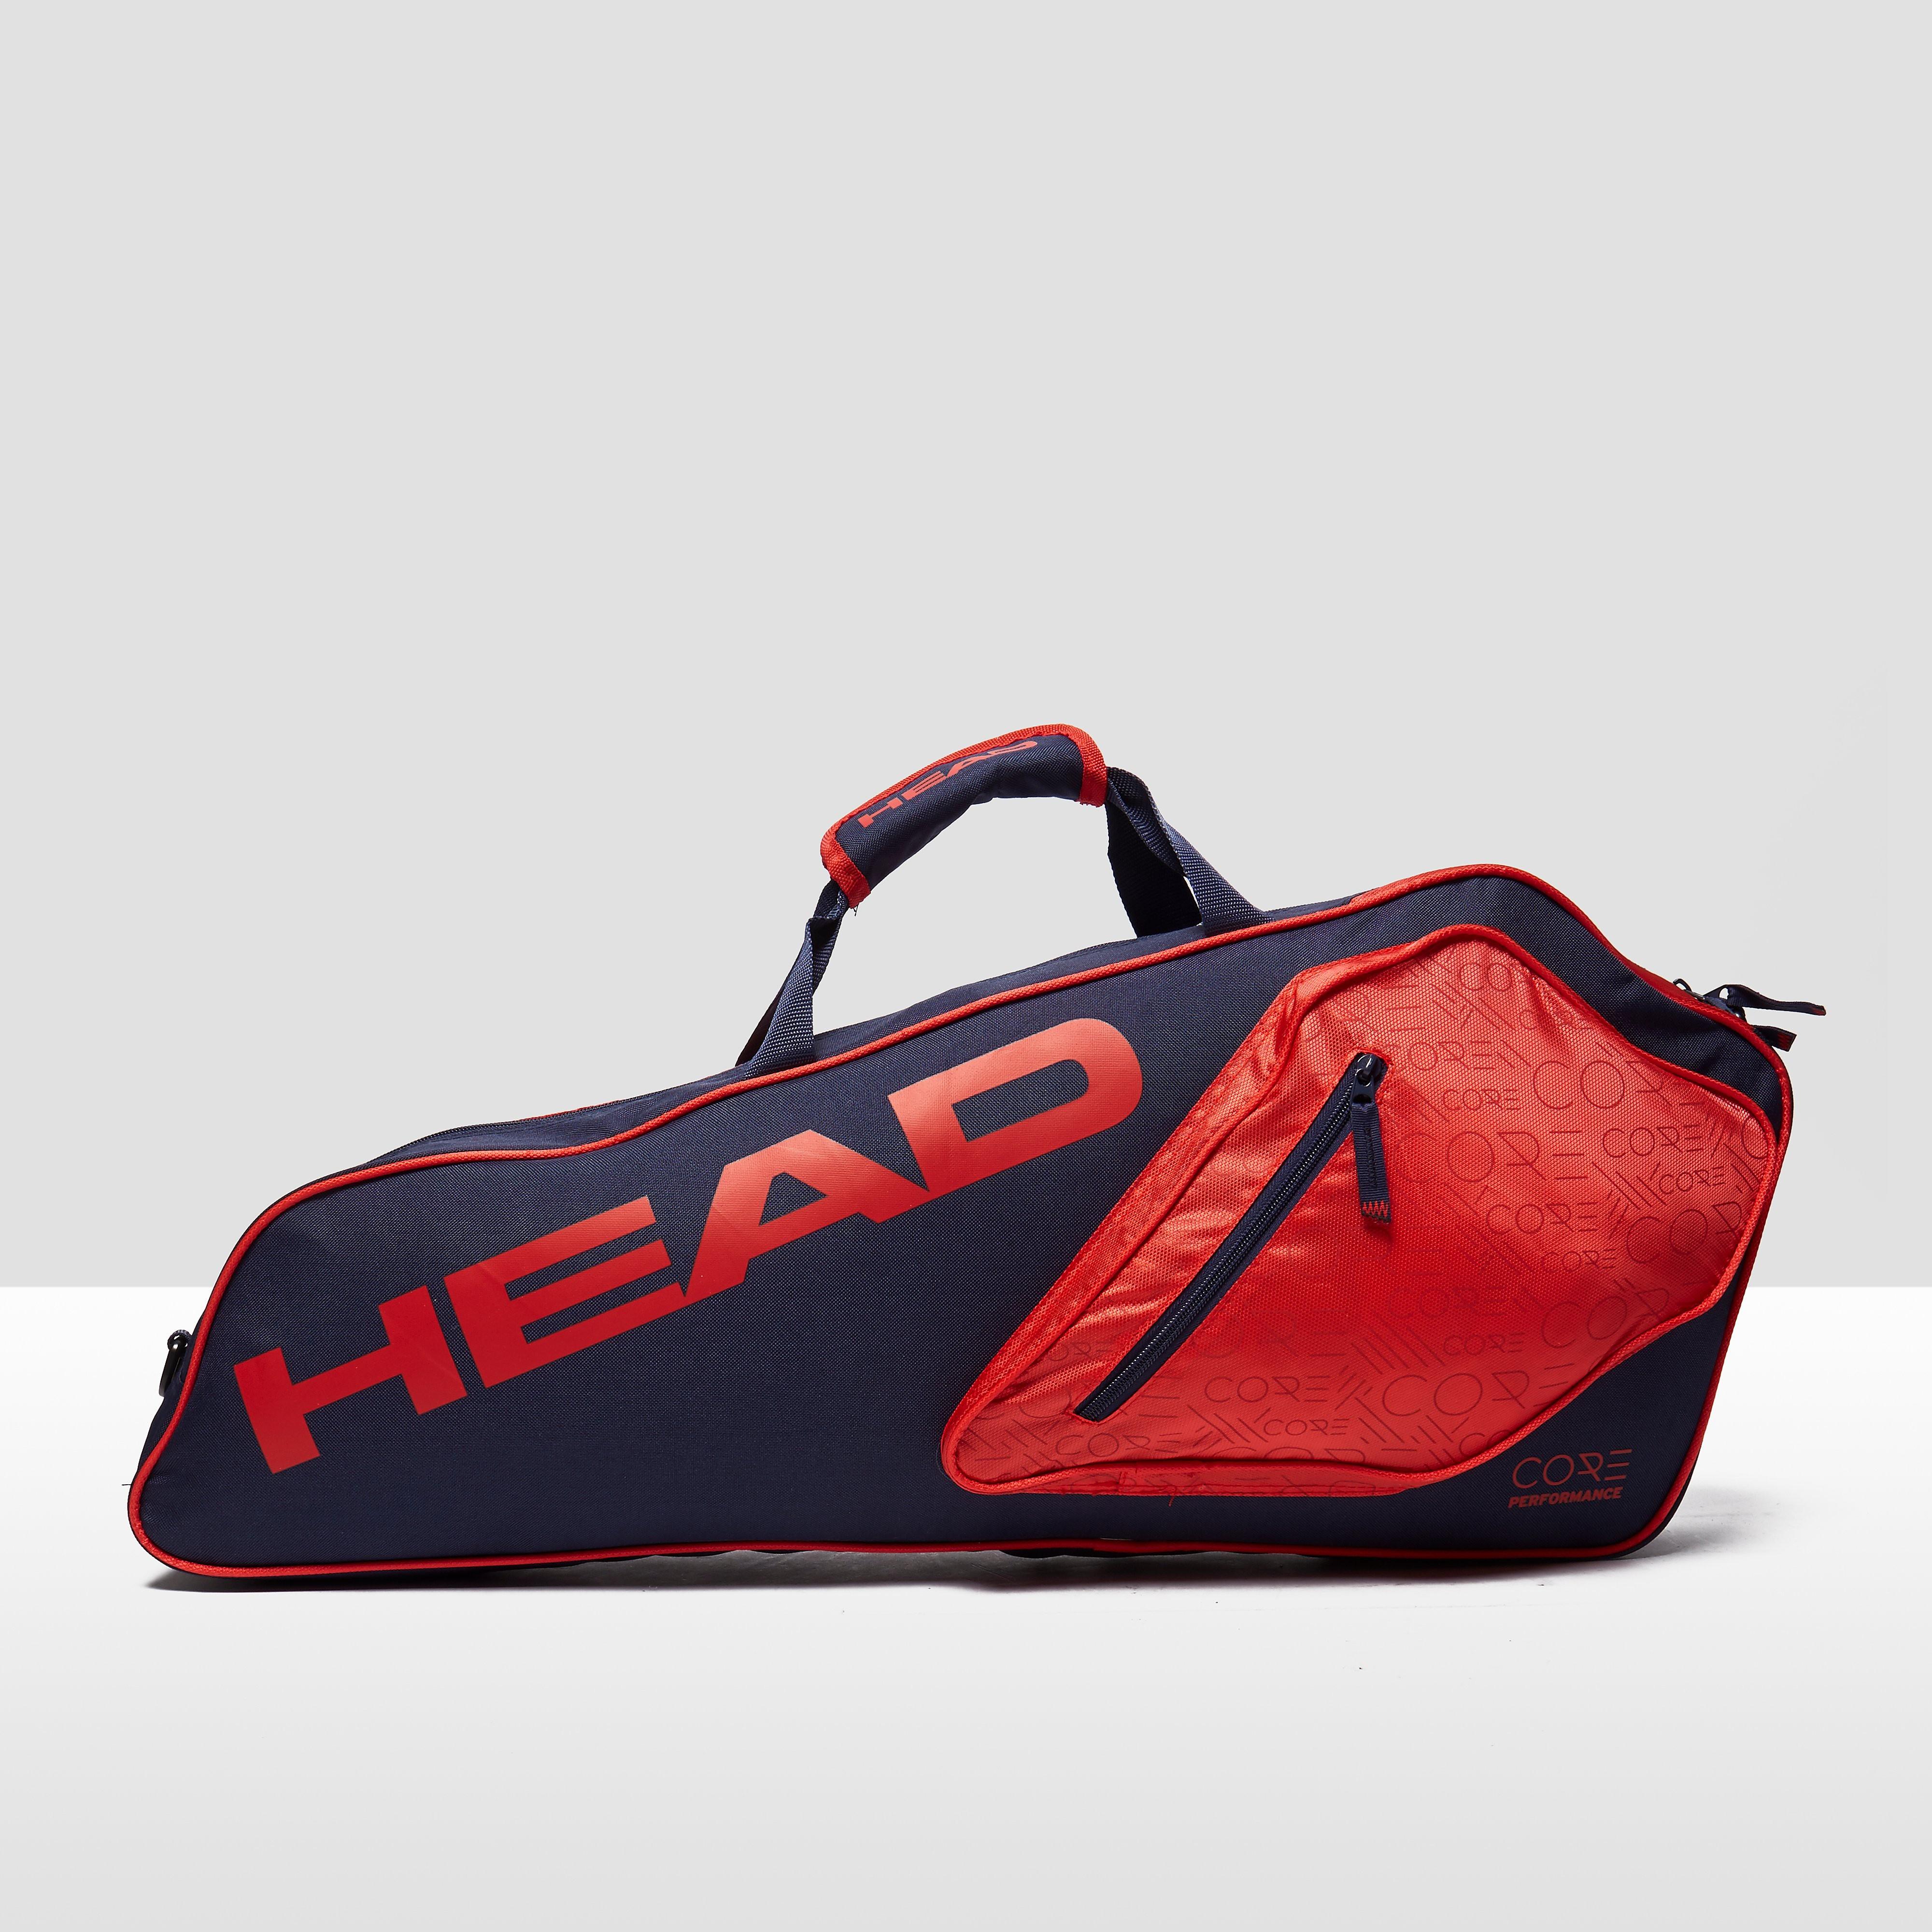 Head Core 3R Pro Racket Bag